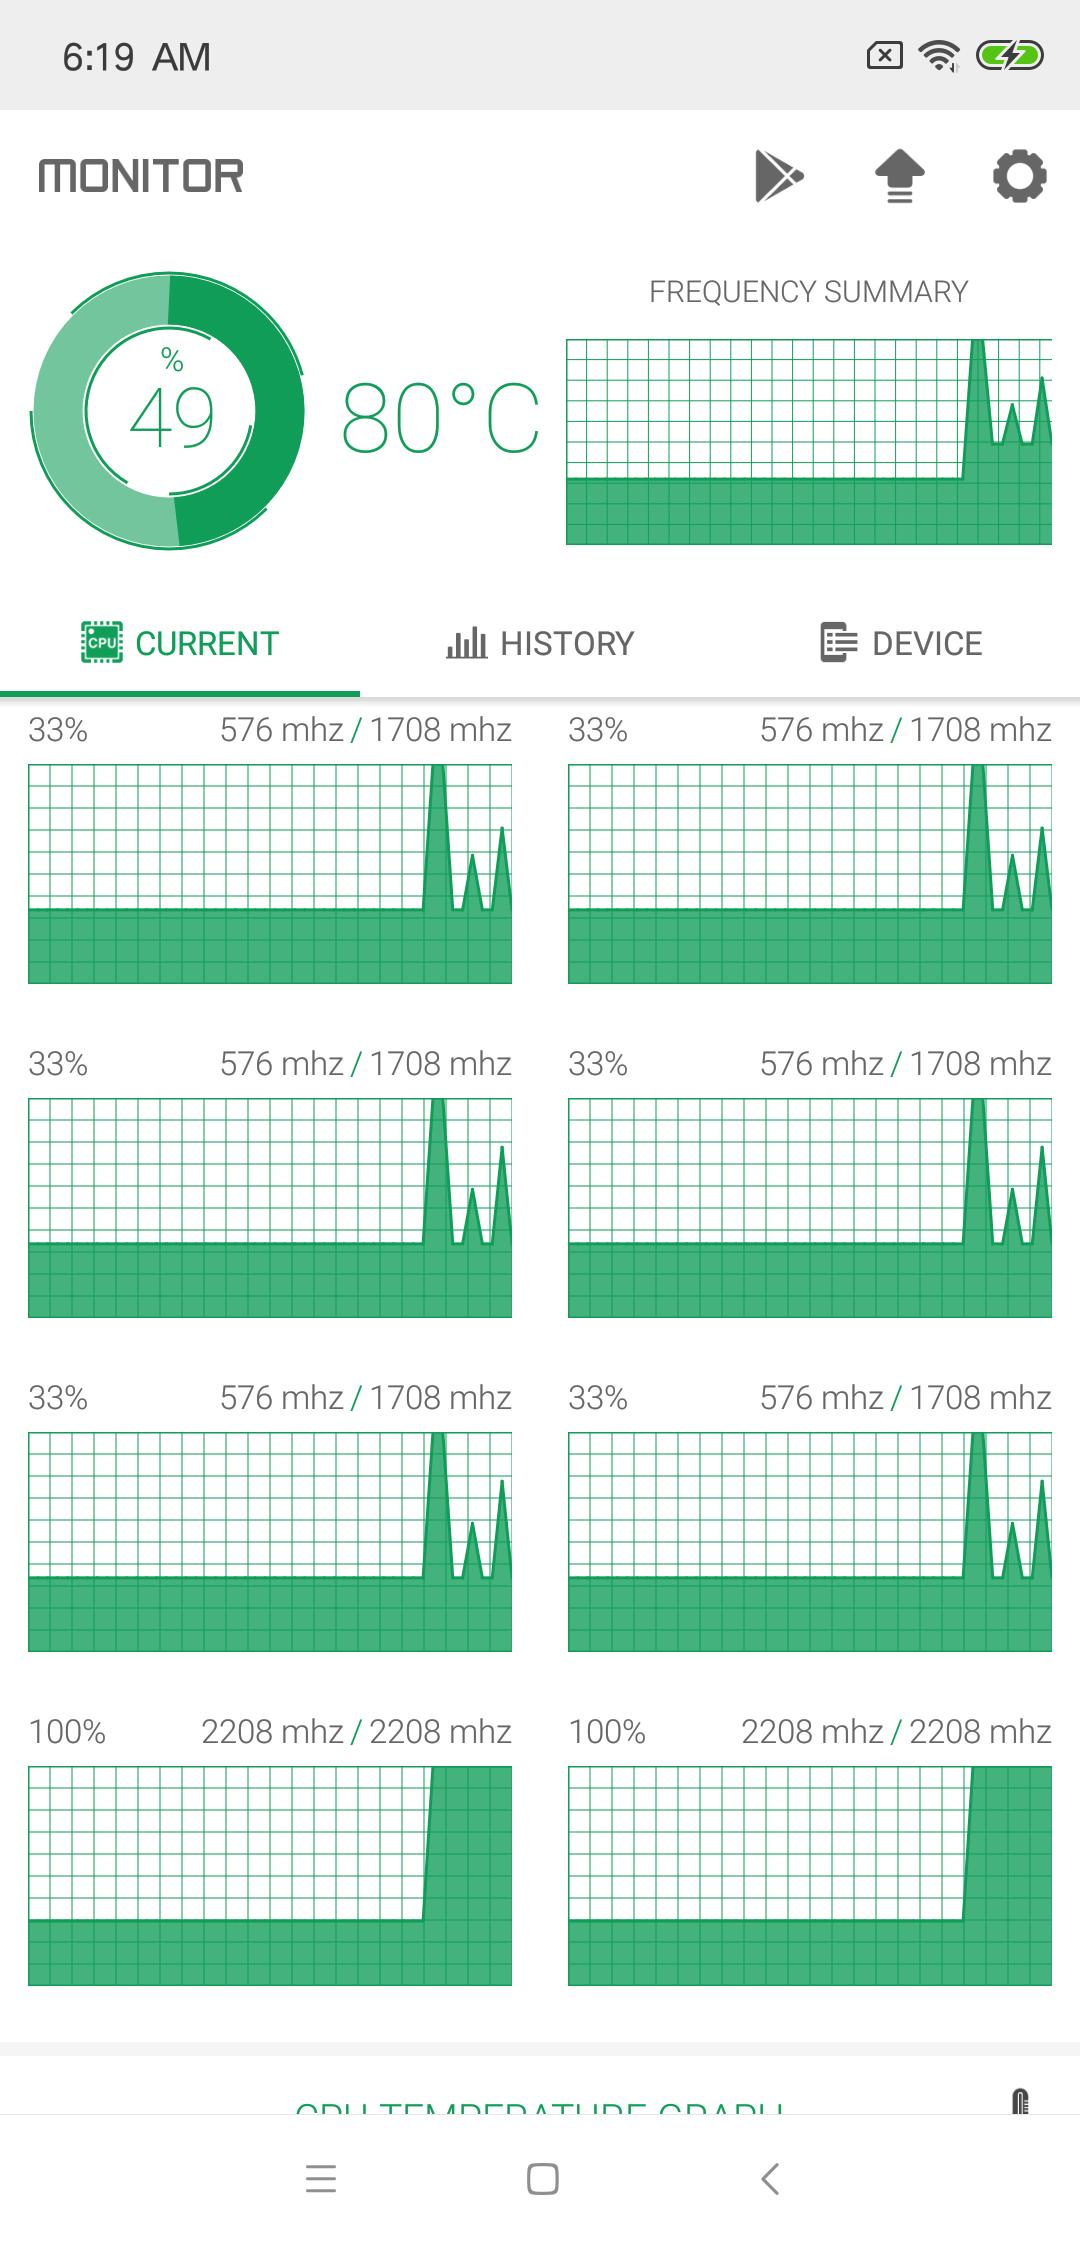 Mi 8 SE Performance Review Xiaomi - mi-globe com